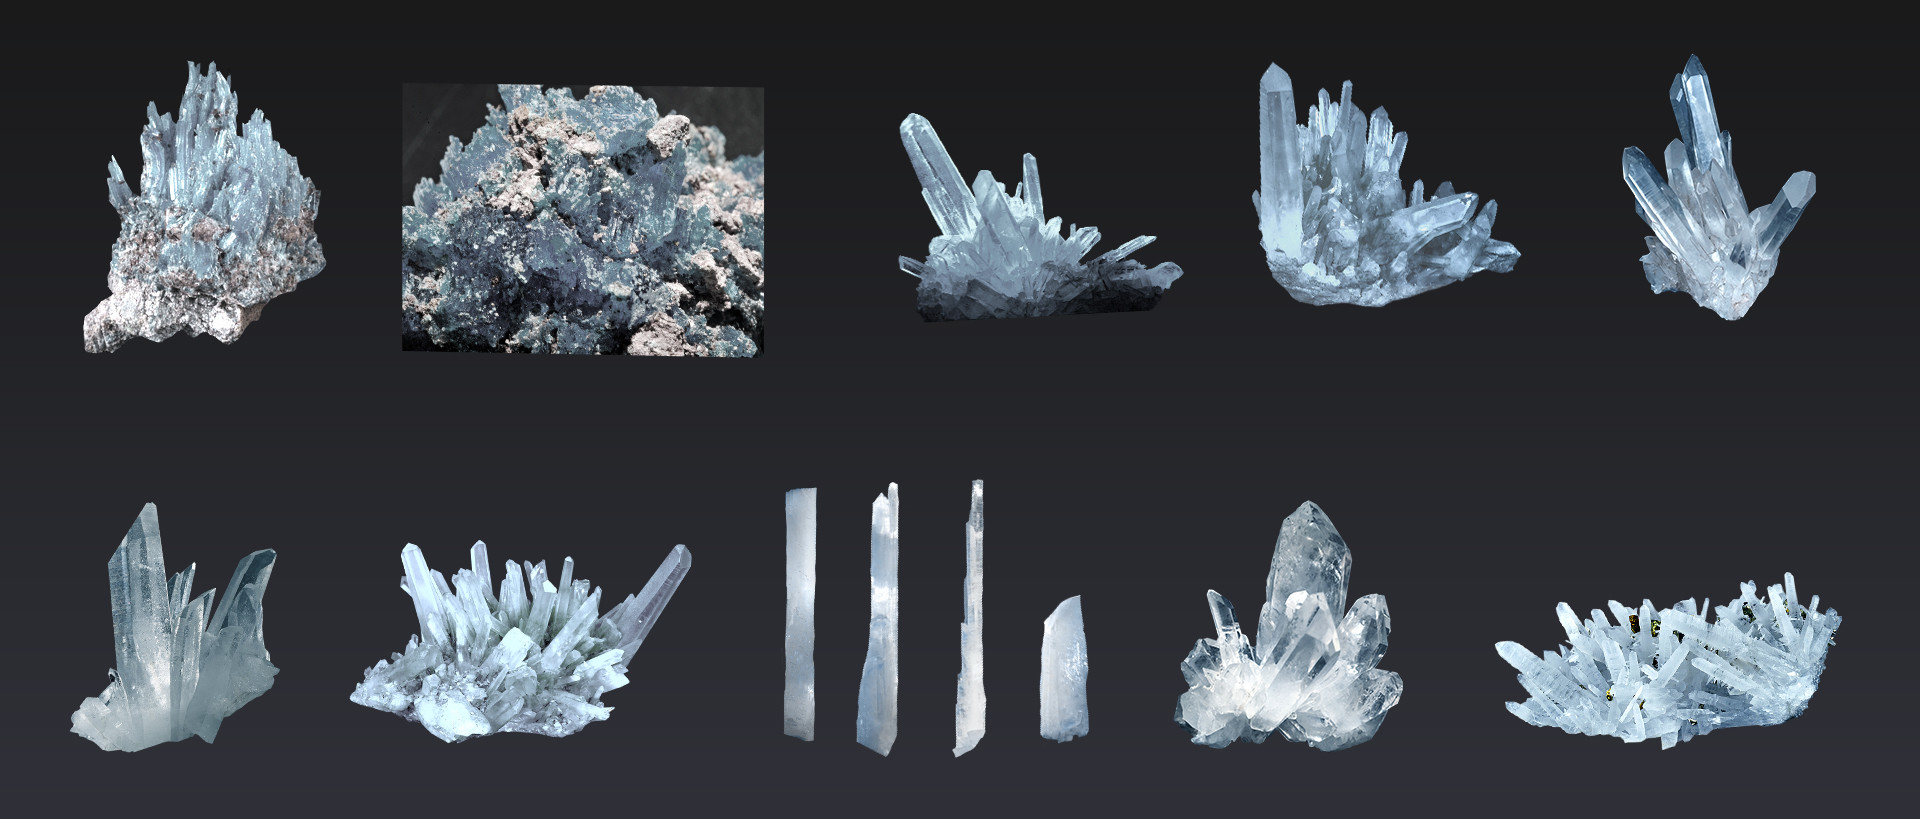 Eva kedves star trekking crystal assets